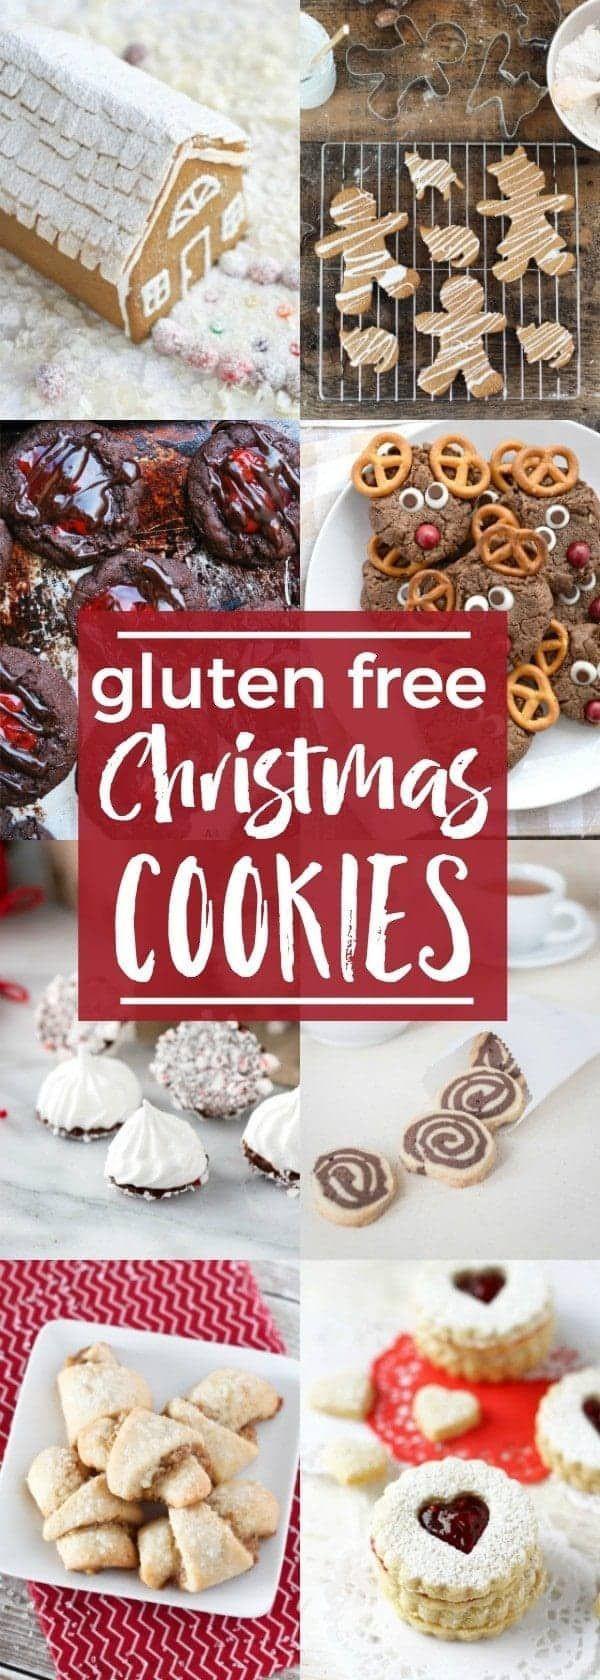 Best Gluten Free Christmas Cookies  Gluten Free Christmas Cookies